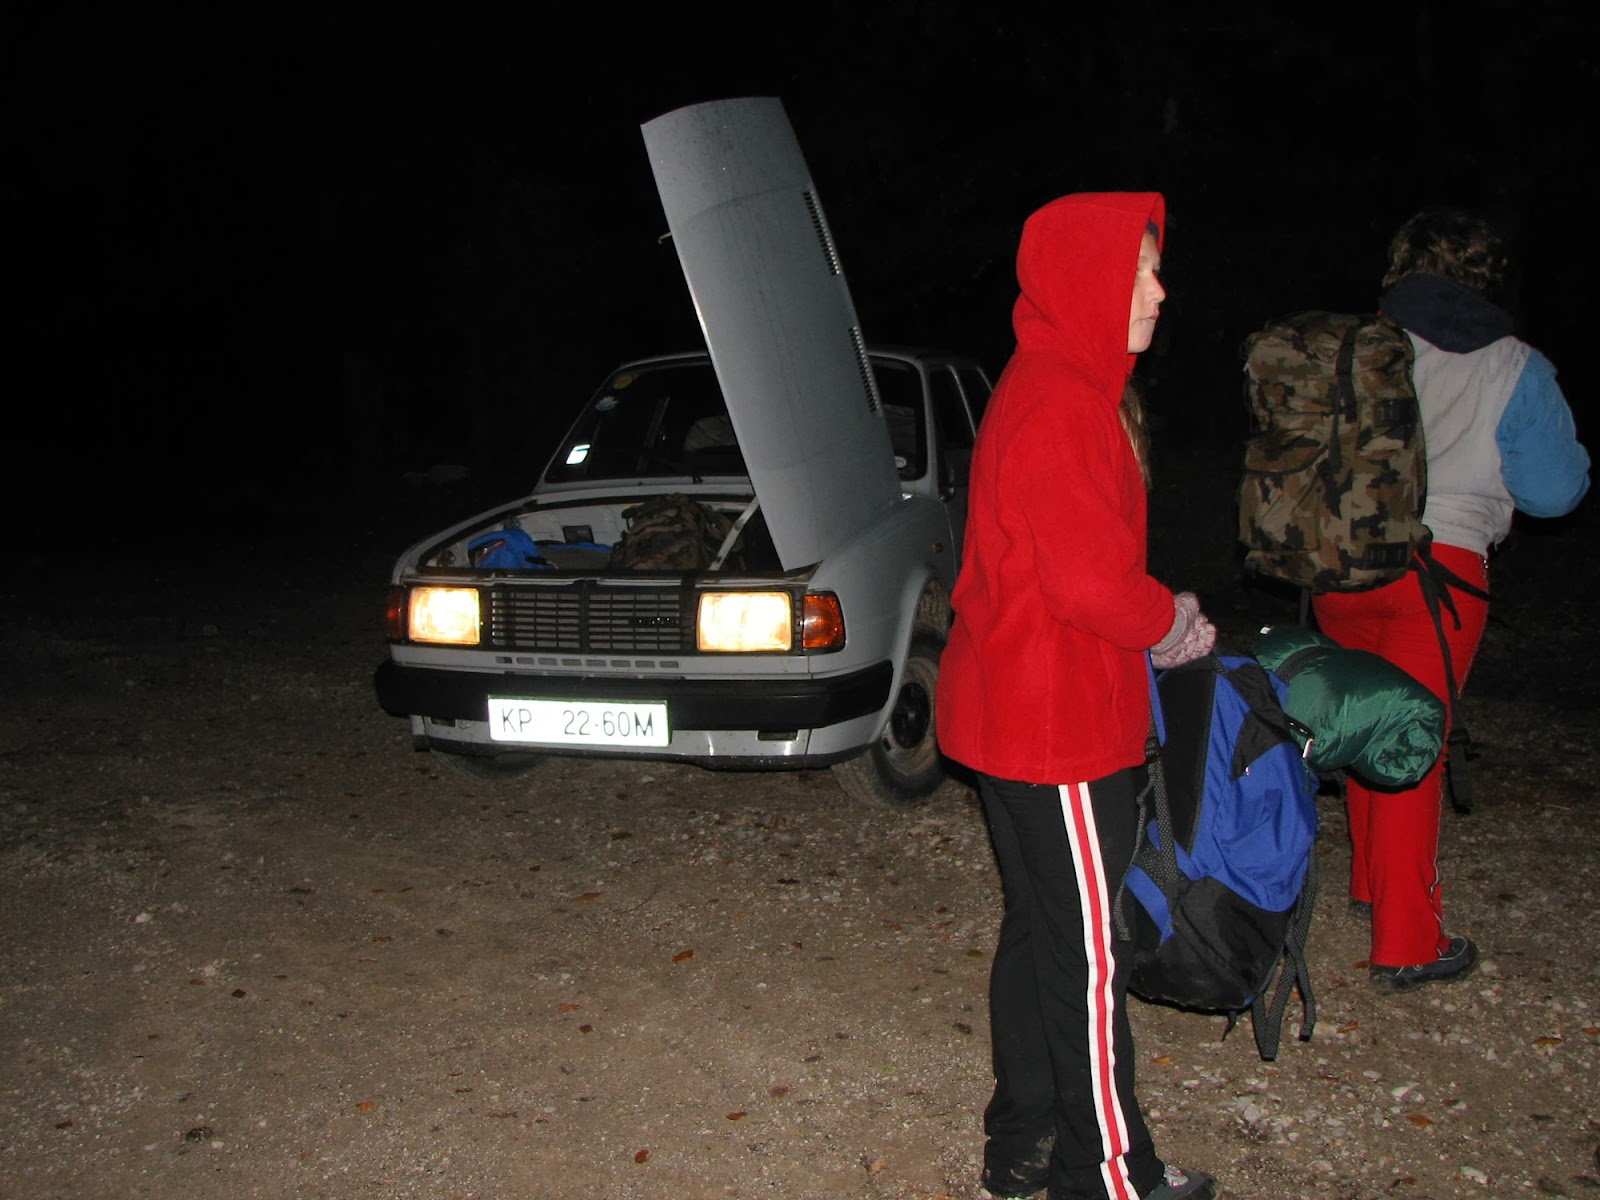 Vodov izlet, Ilirska Bistrica 2005 - Picture%2B063.jpg